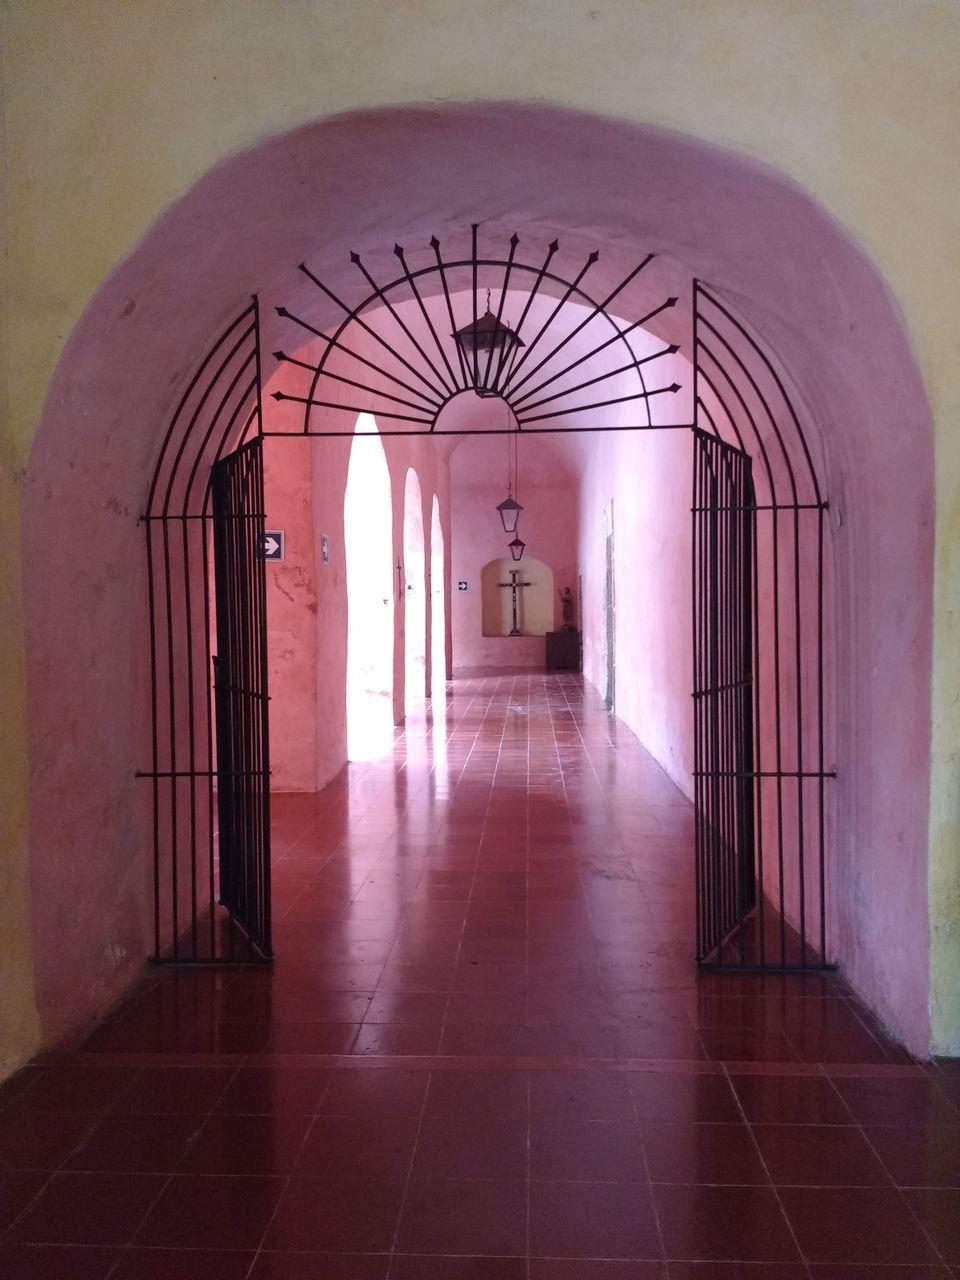 corridor, door, indoors, the way forward, empty, arch, architecture, built structure, no people, day